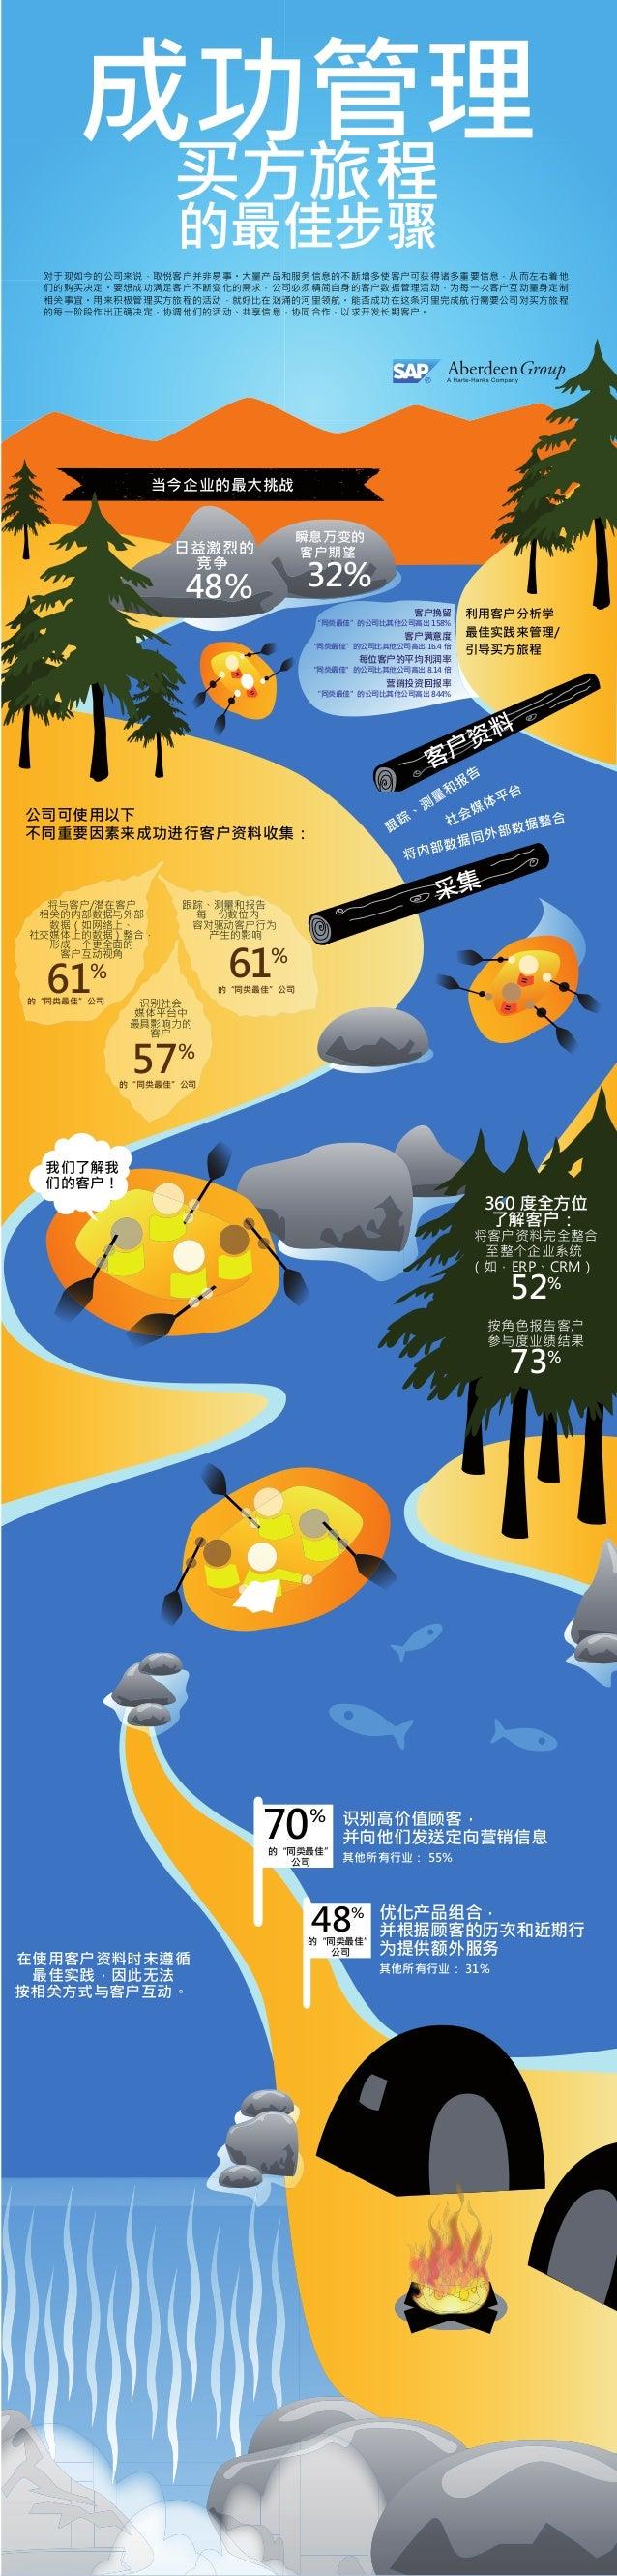 Customer Analytics Infographic (Simplified Chinese)